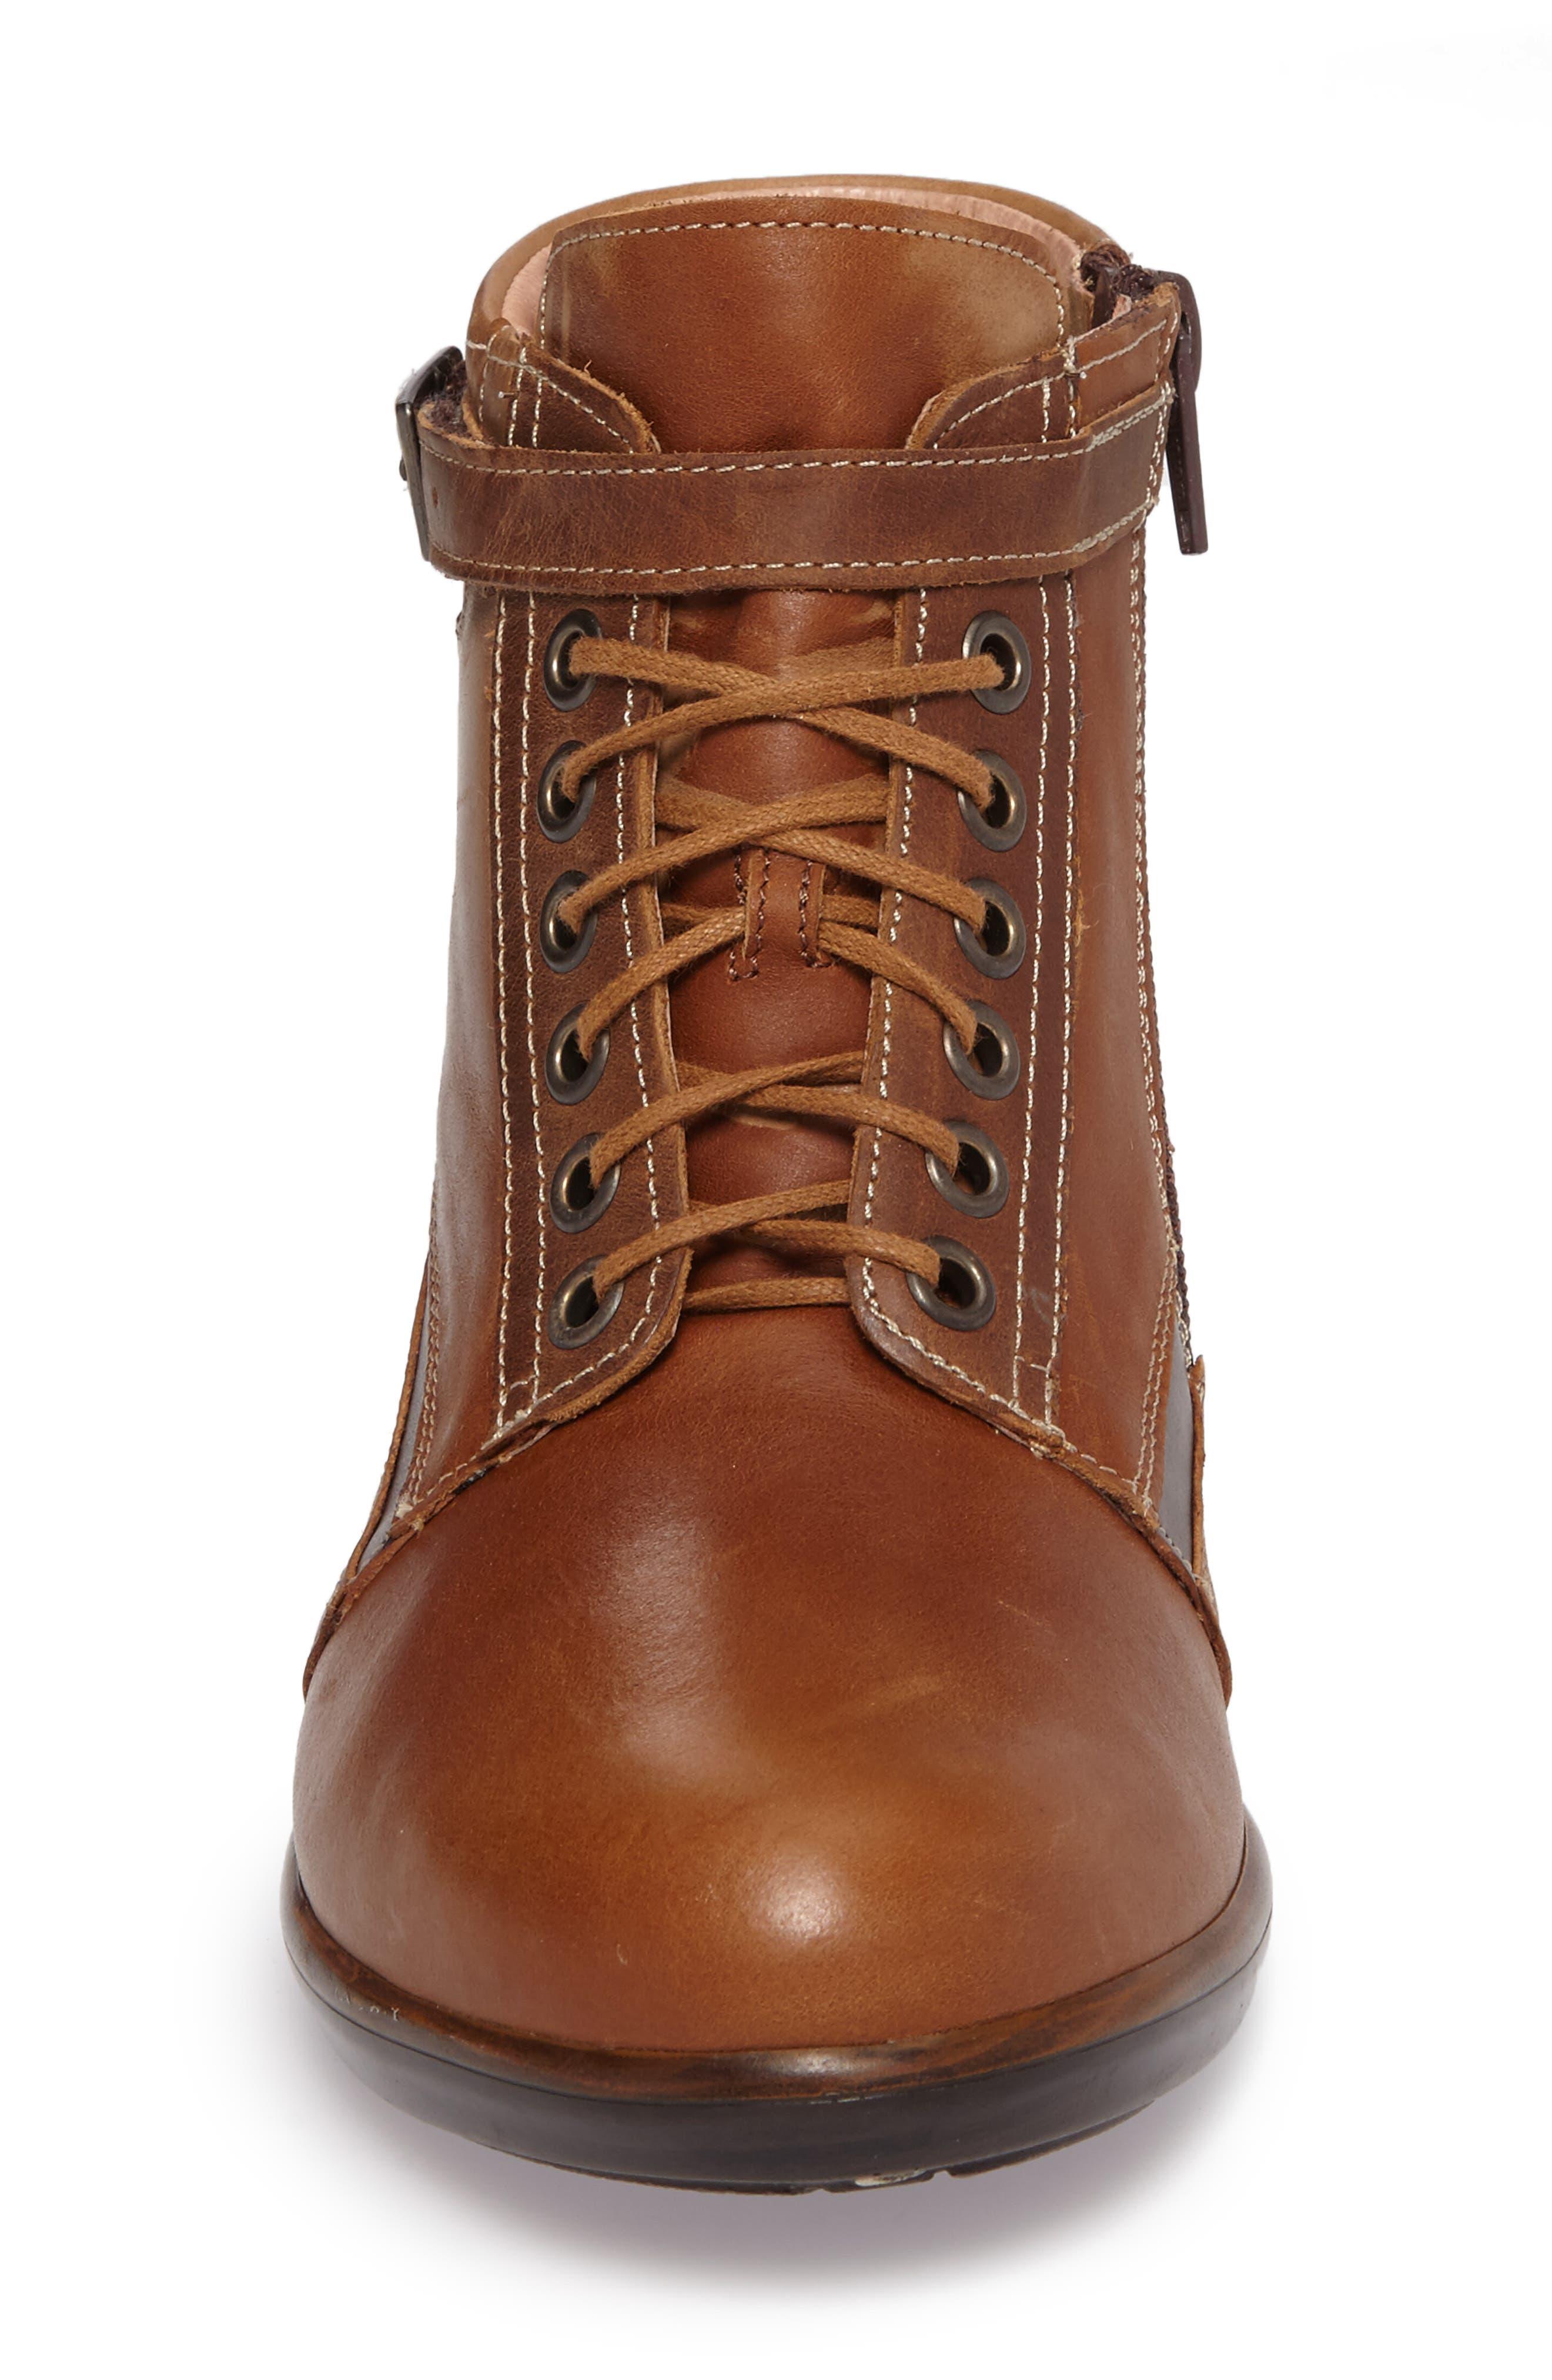 Kona Boot,                             Alternate thumbnail 4, color,                             Vintage Camel Leather